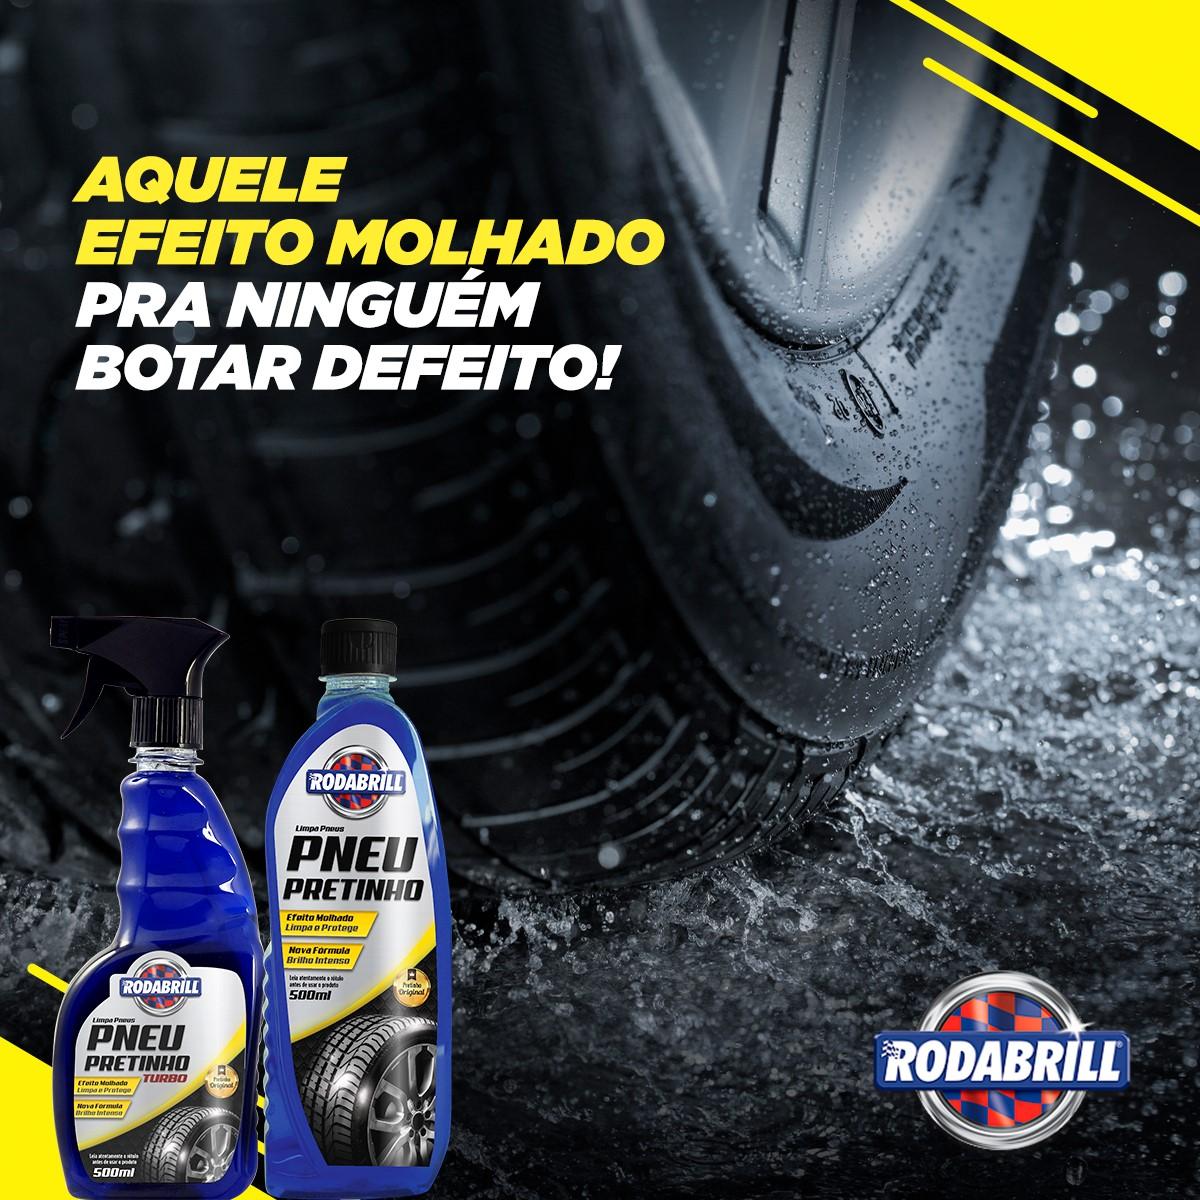 Pneu Pretinho (500Ml) - Rodabrill